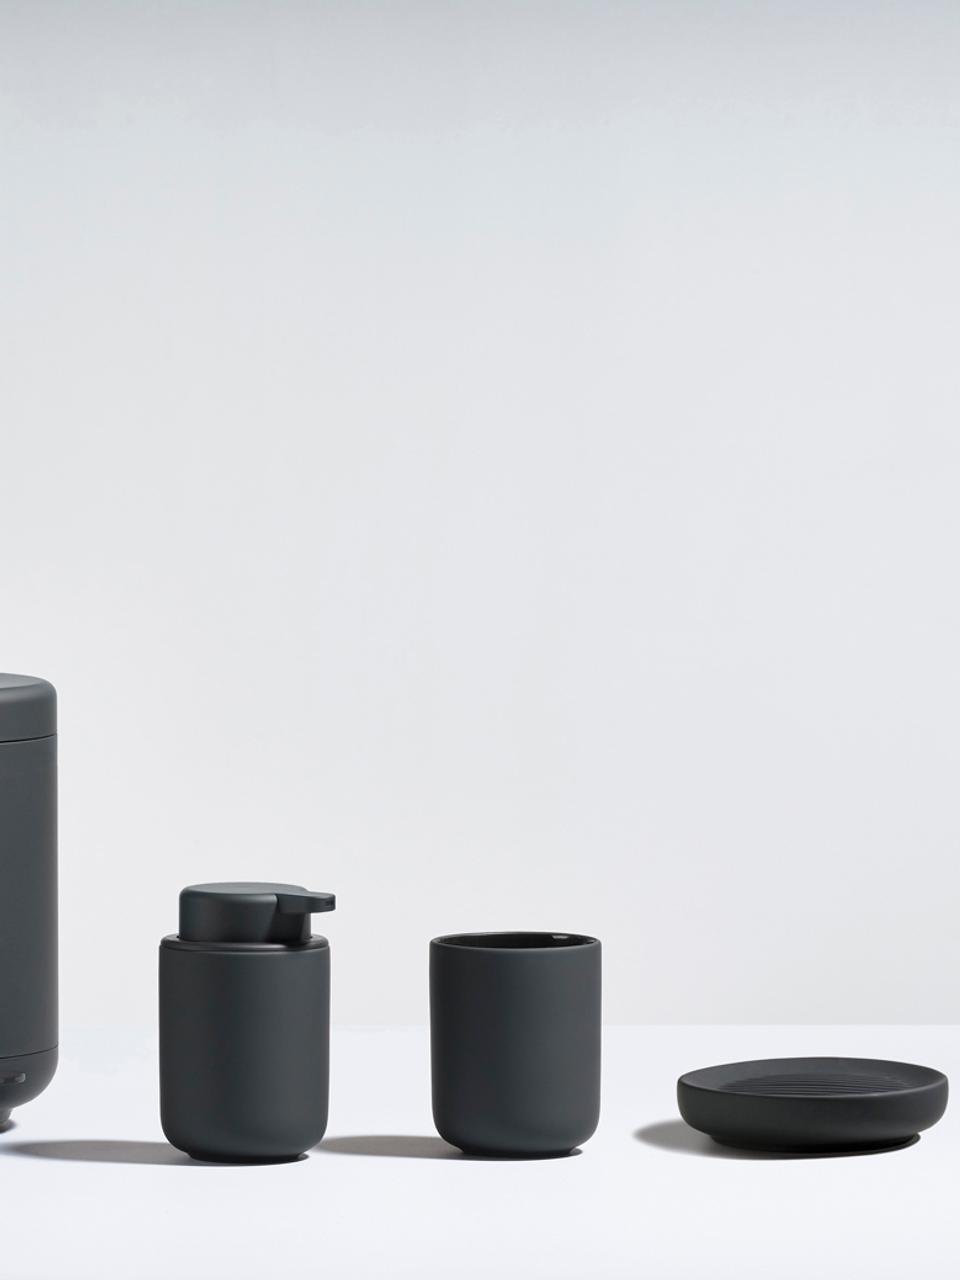 Portasapone in porcellana Ume, Porcellana, Nero, Ø 12 x Alt. 3 cm